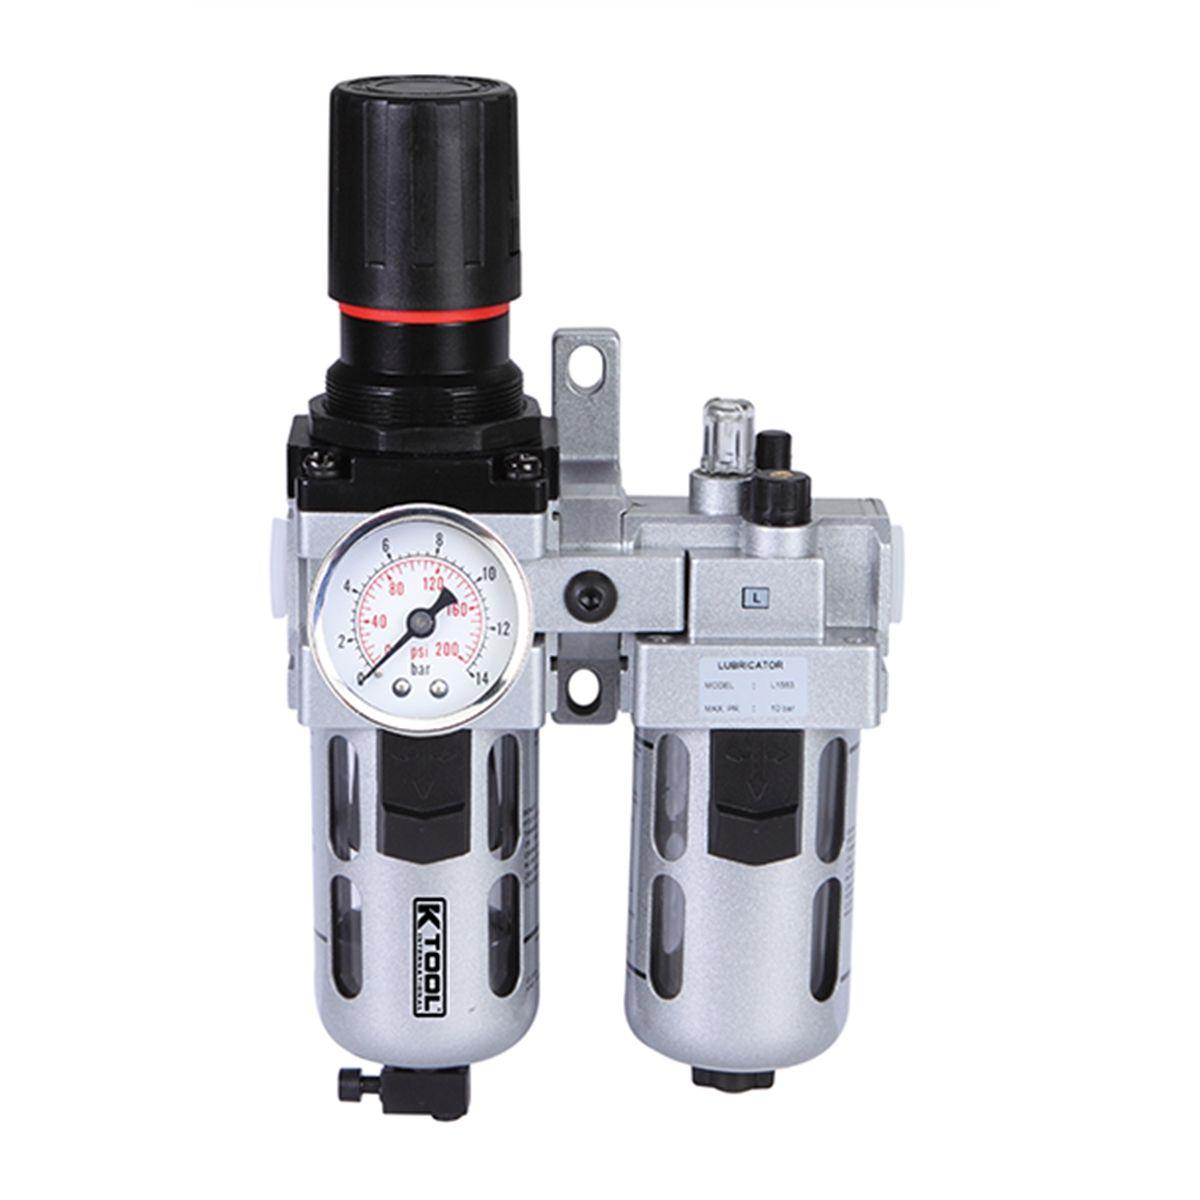 K Tool International Filter Regulator Amp Lubricator Kti89195